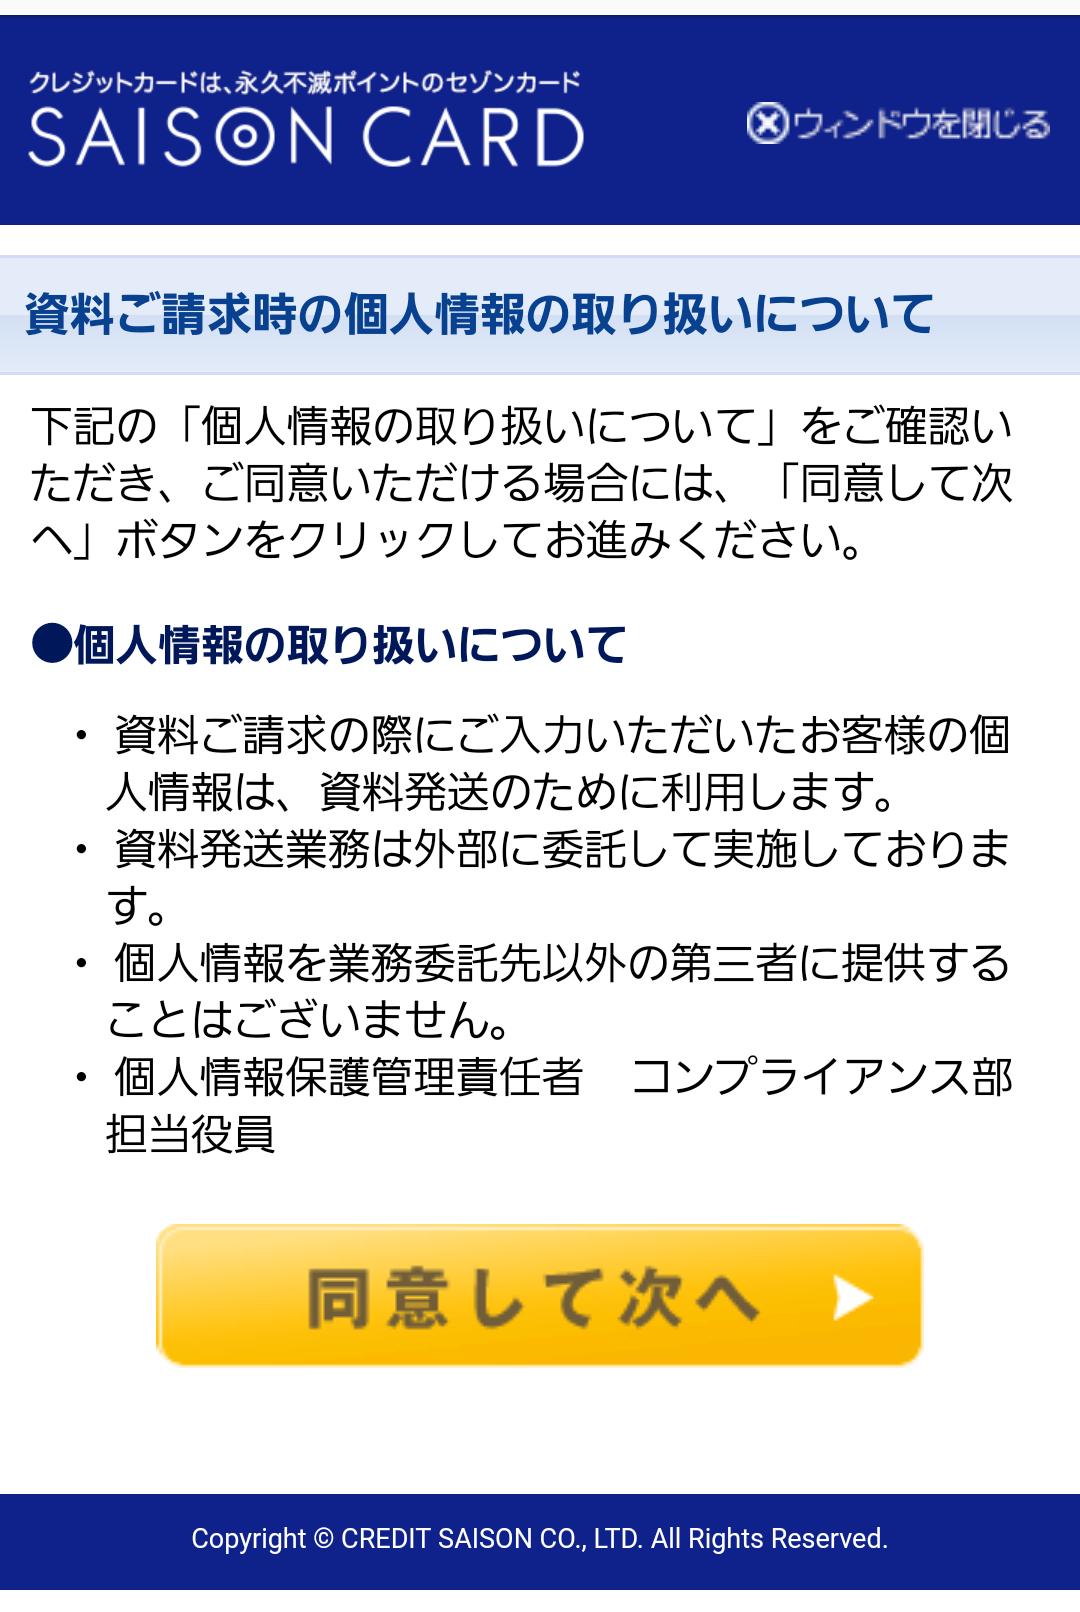 Screenshot_saison_moneycard_zougaku4.png